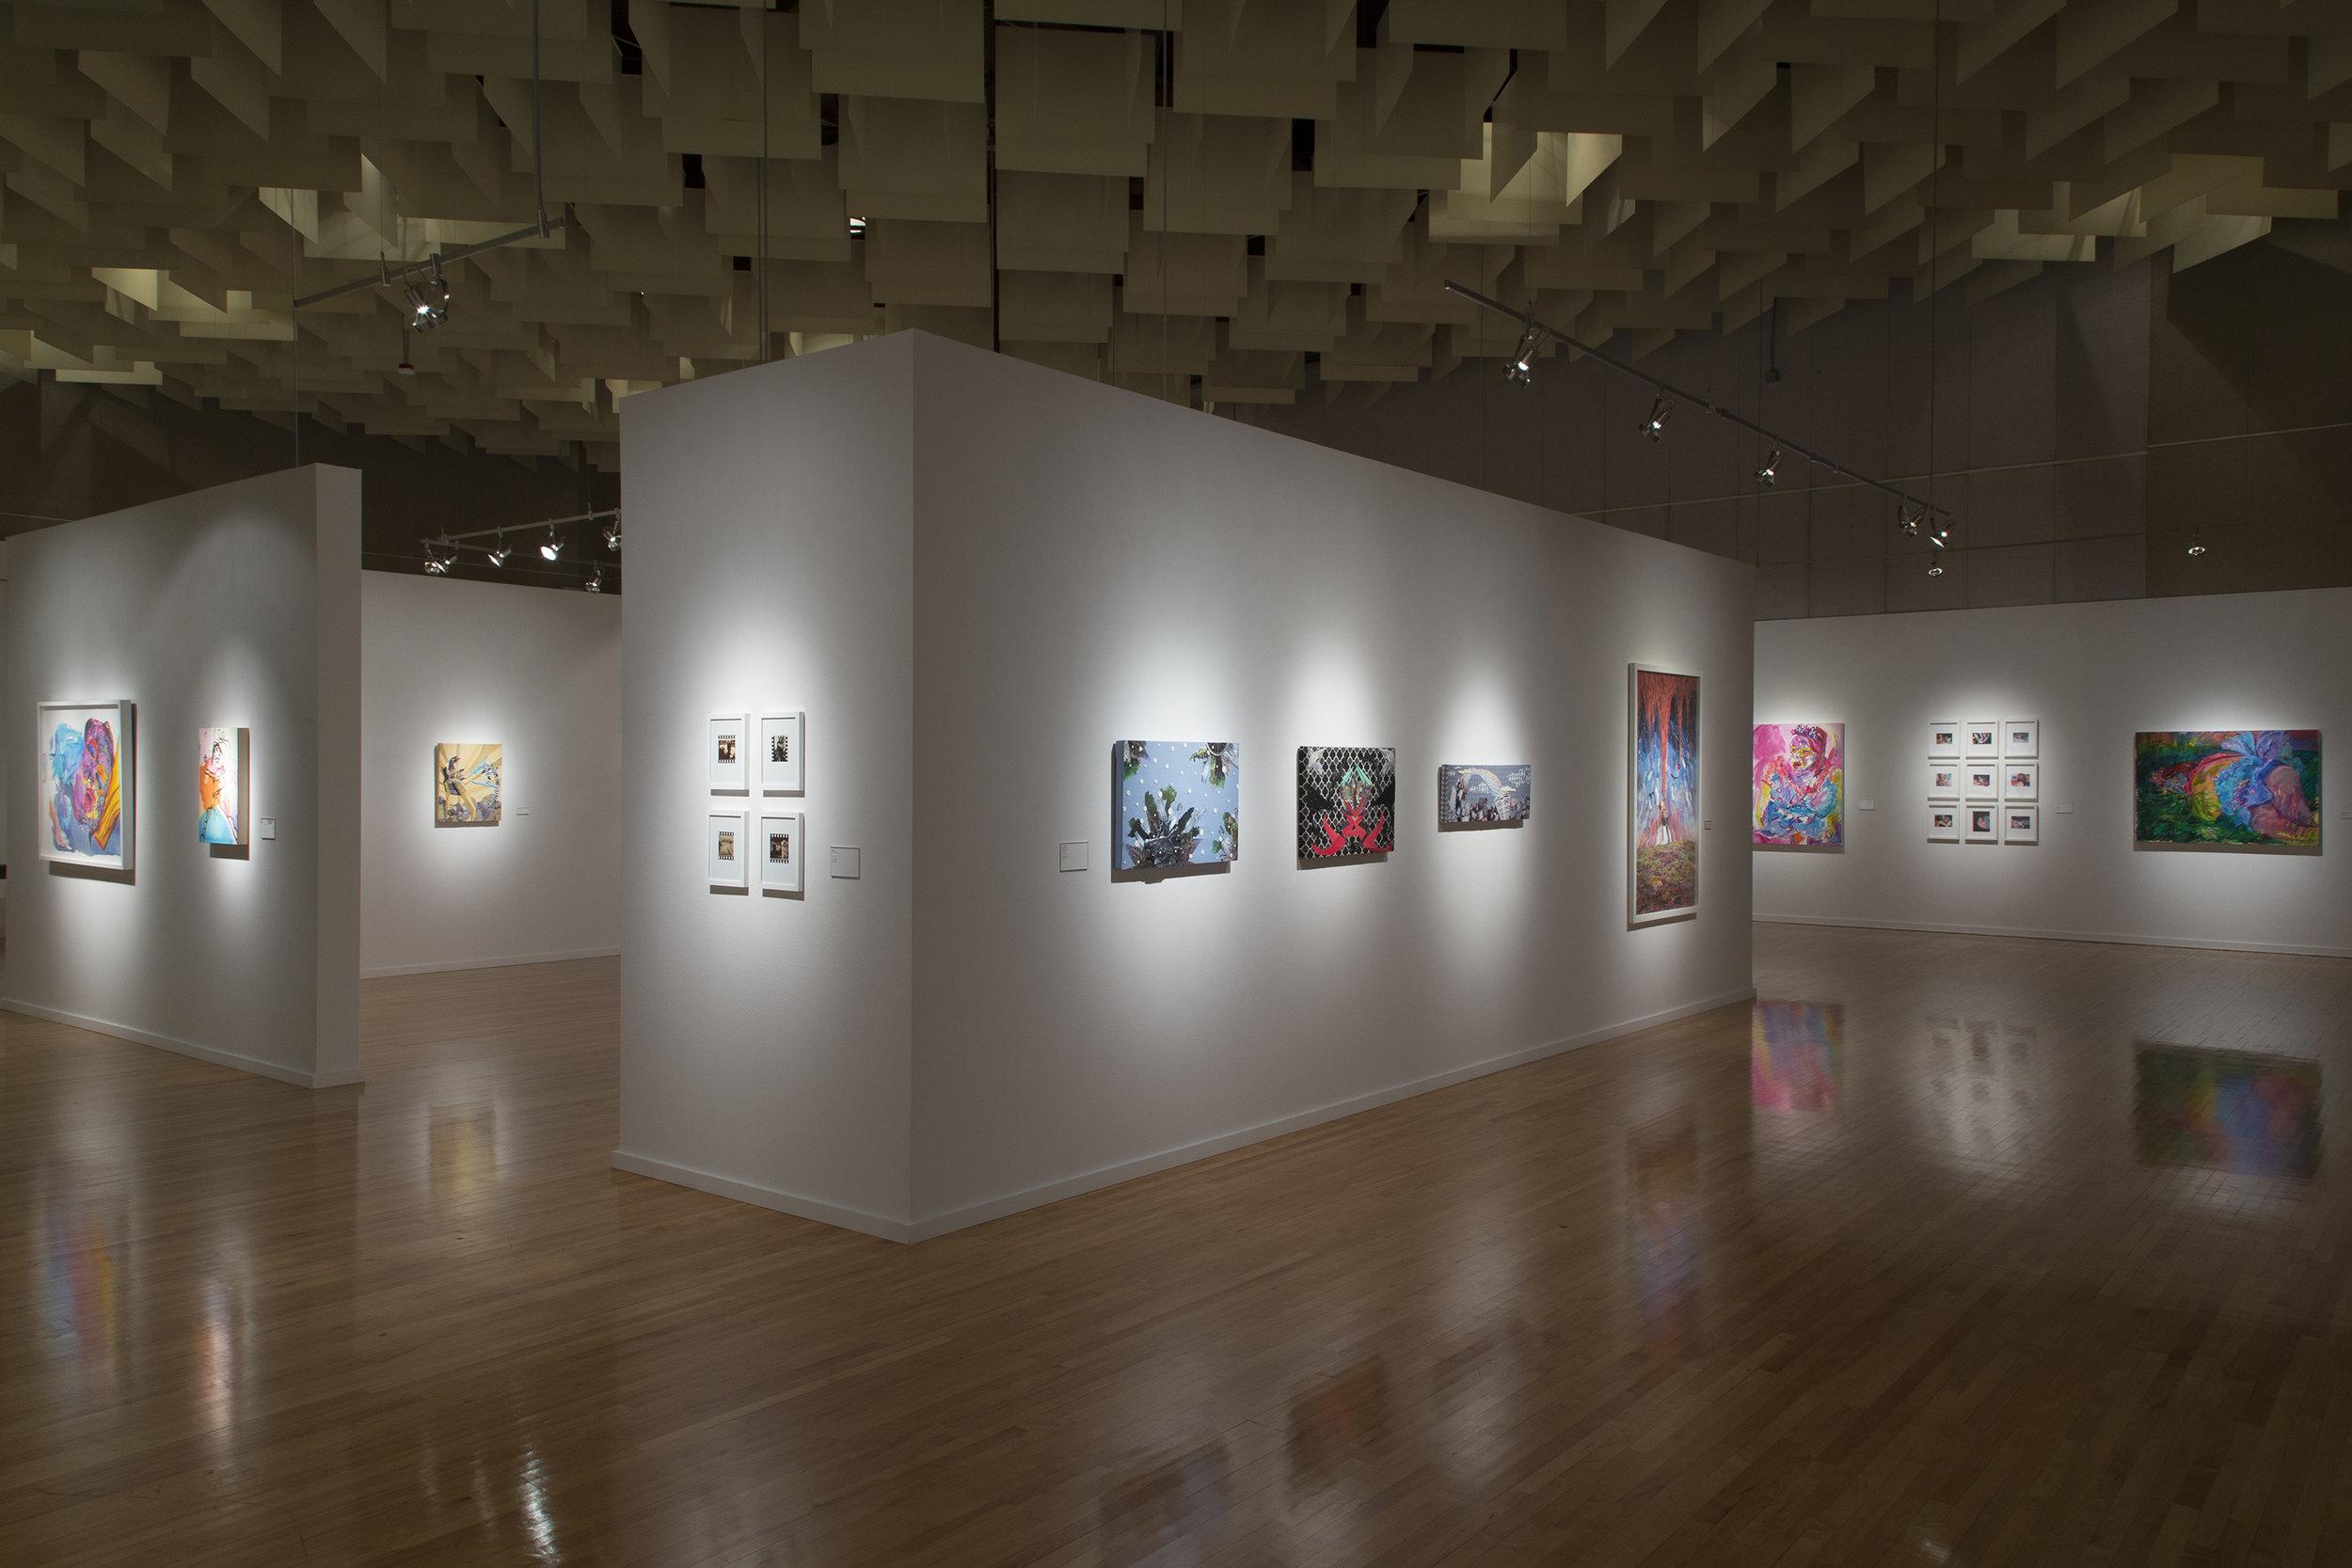 Installation view, Break Ups & Tear Downs at the Marjorie Barrick Museum (image Checko Salgado)